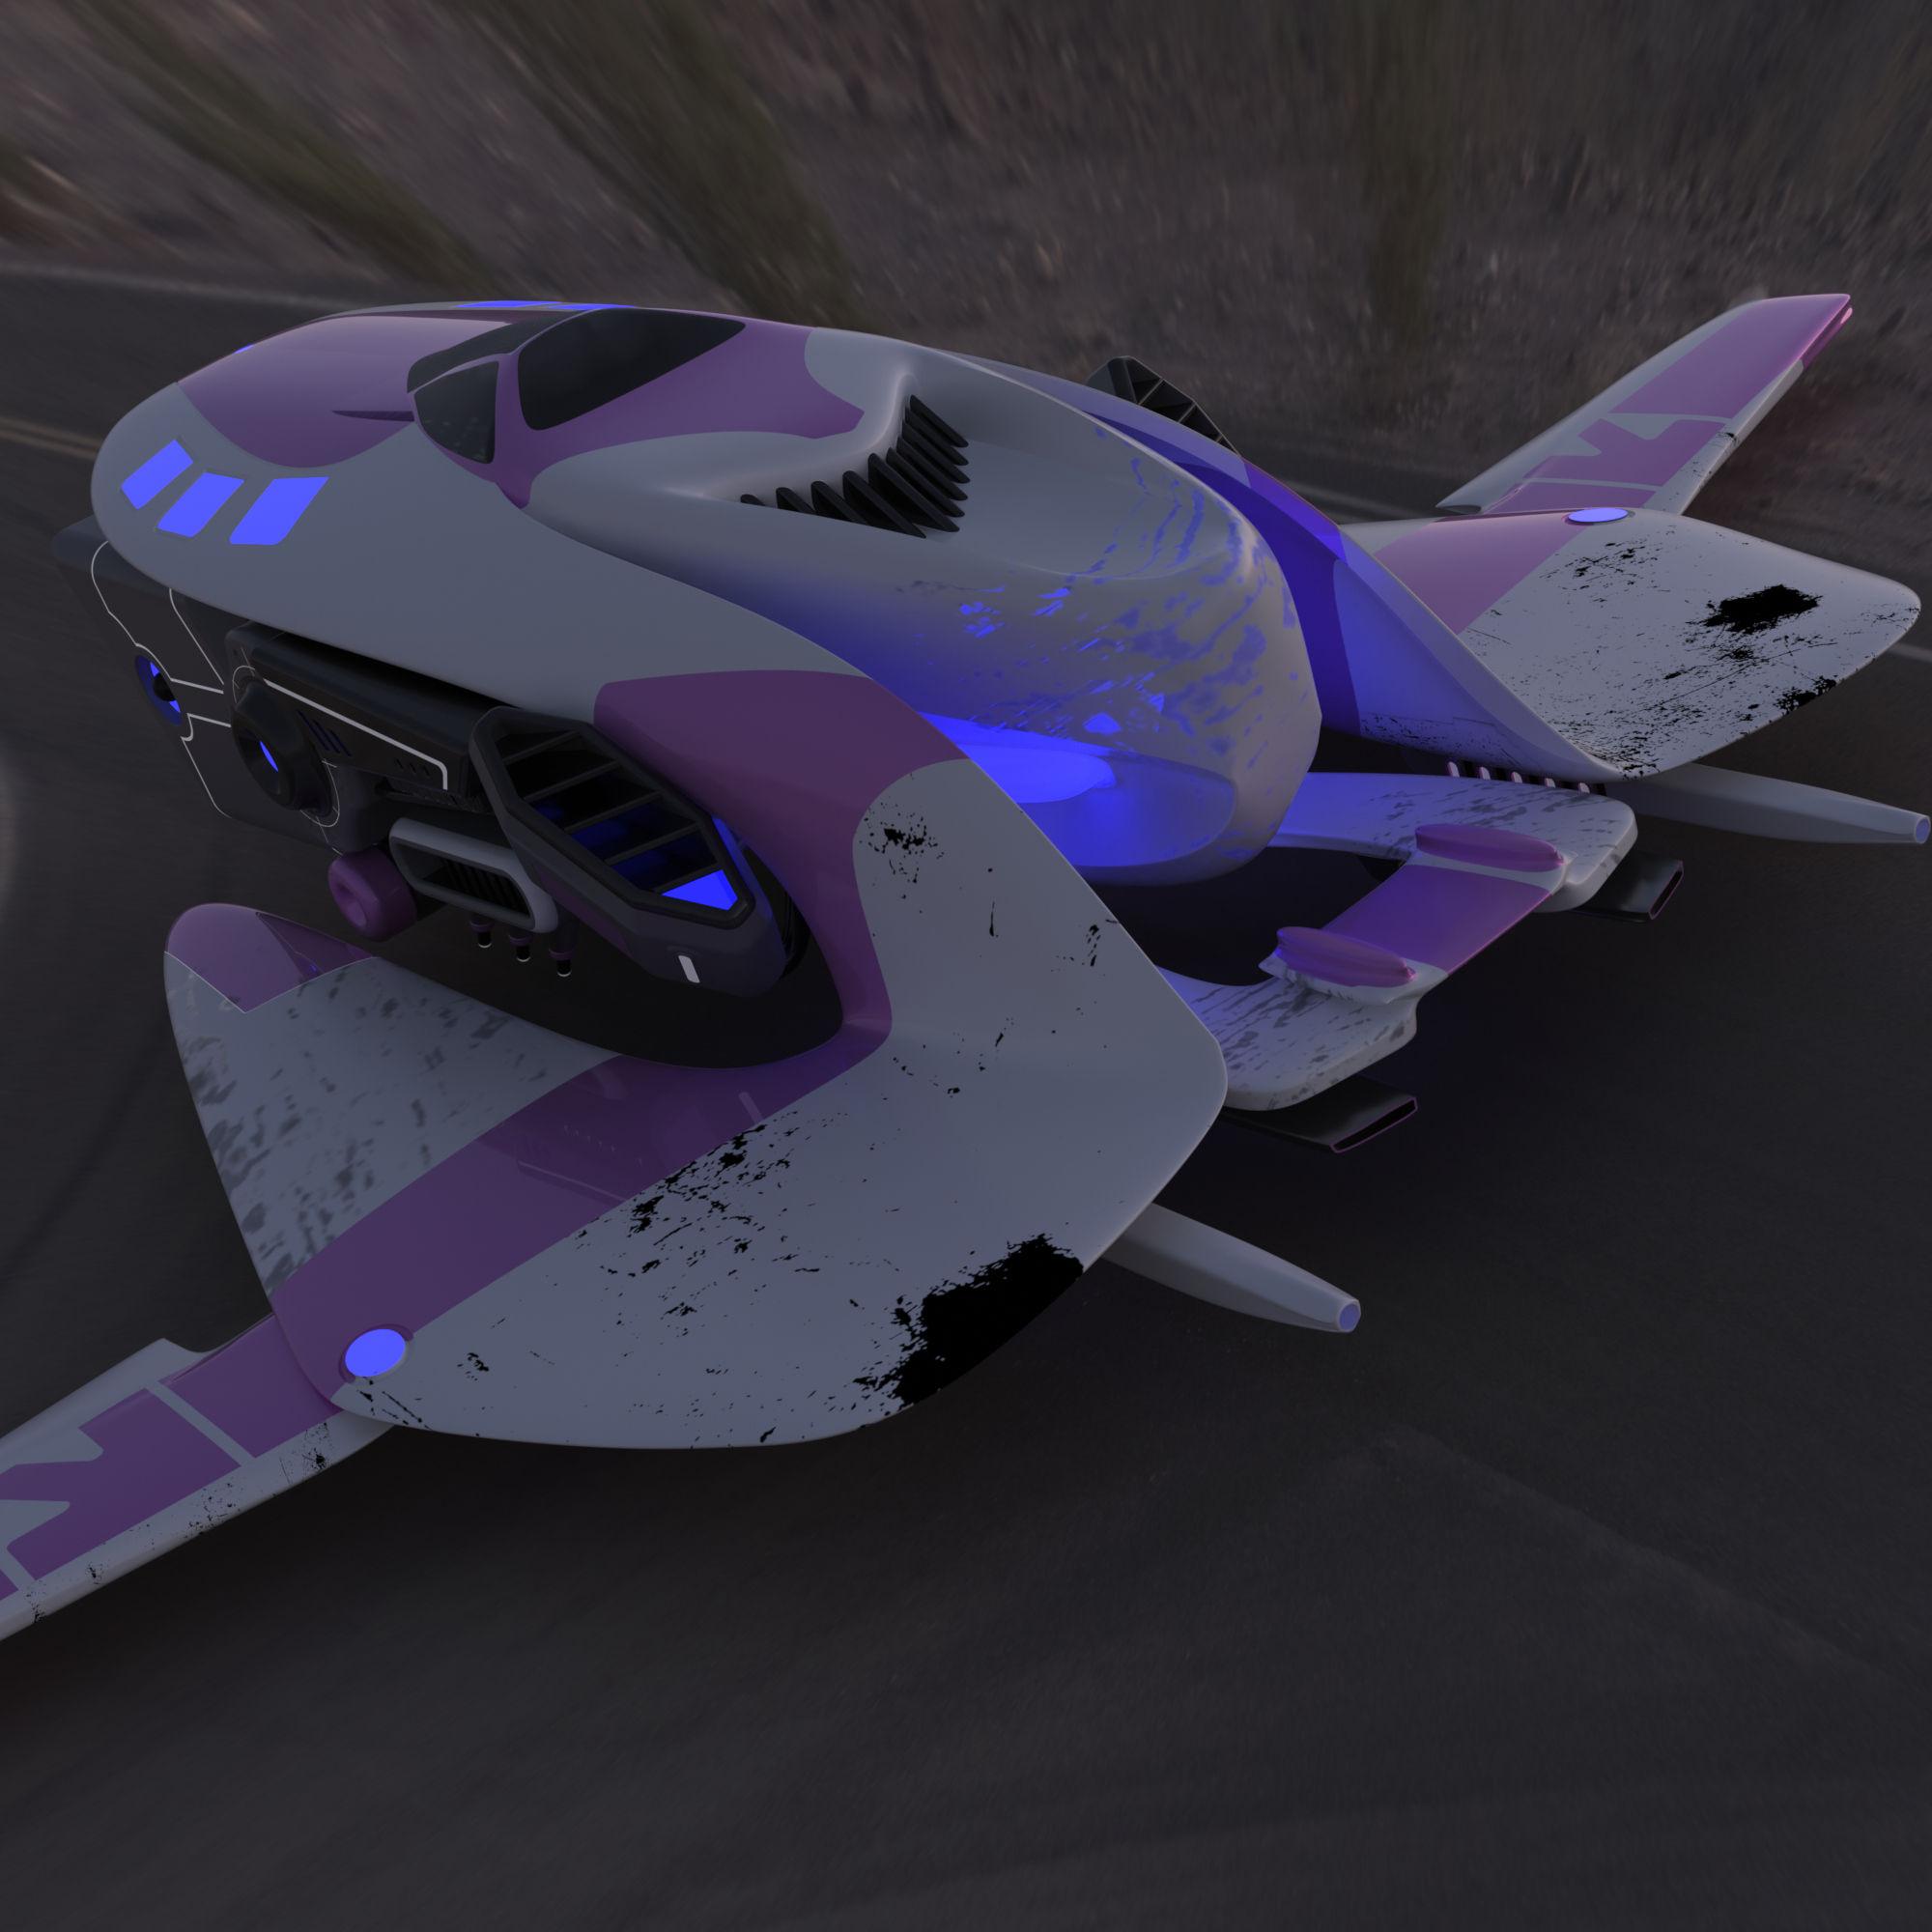 Space-ship-final-render-3500-3500